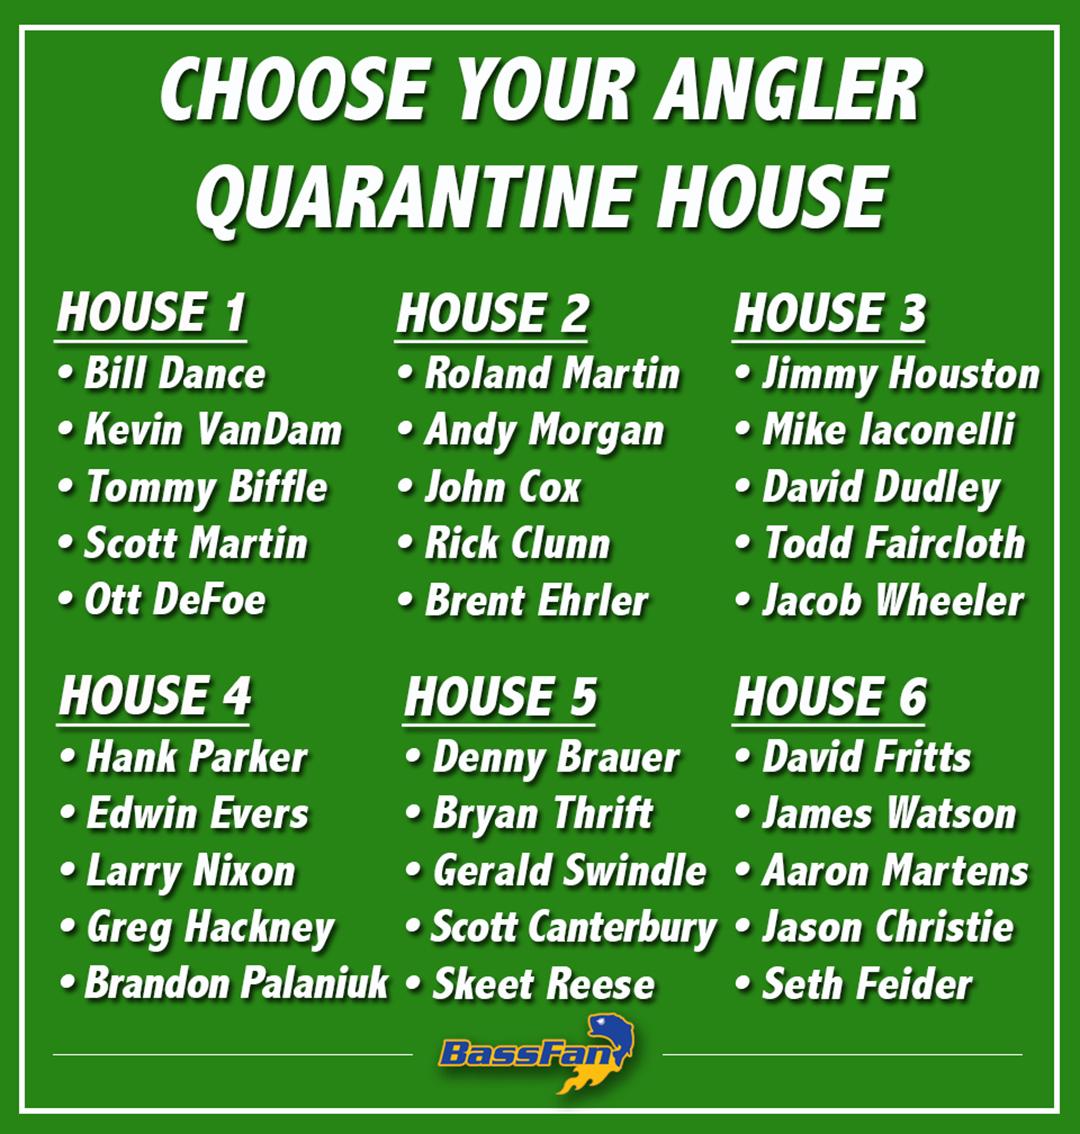 Pick your angler quarantine house